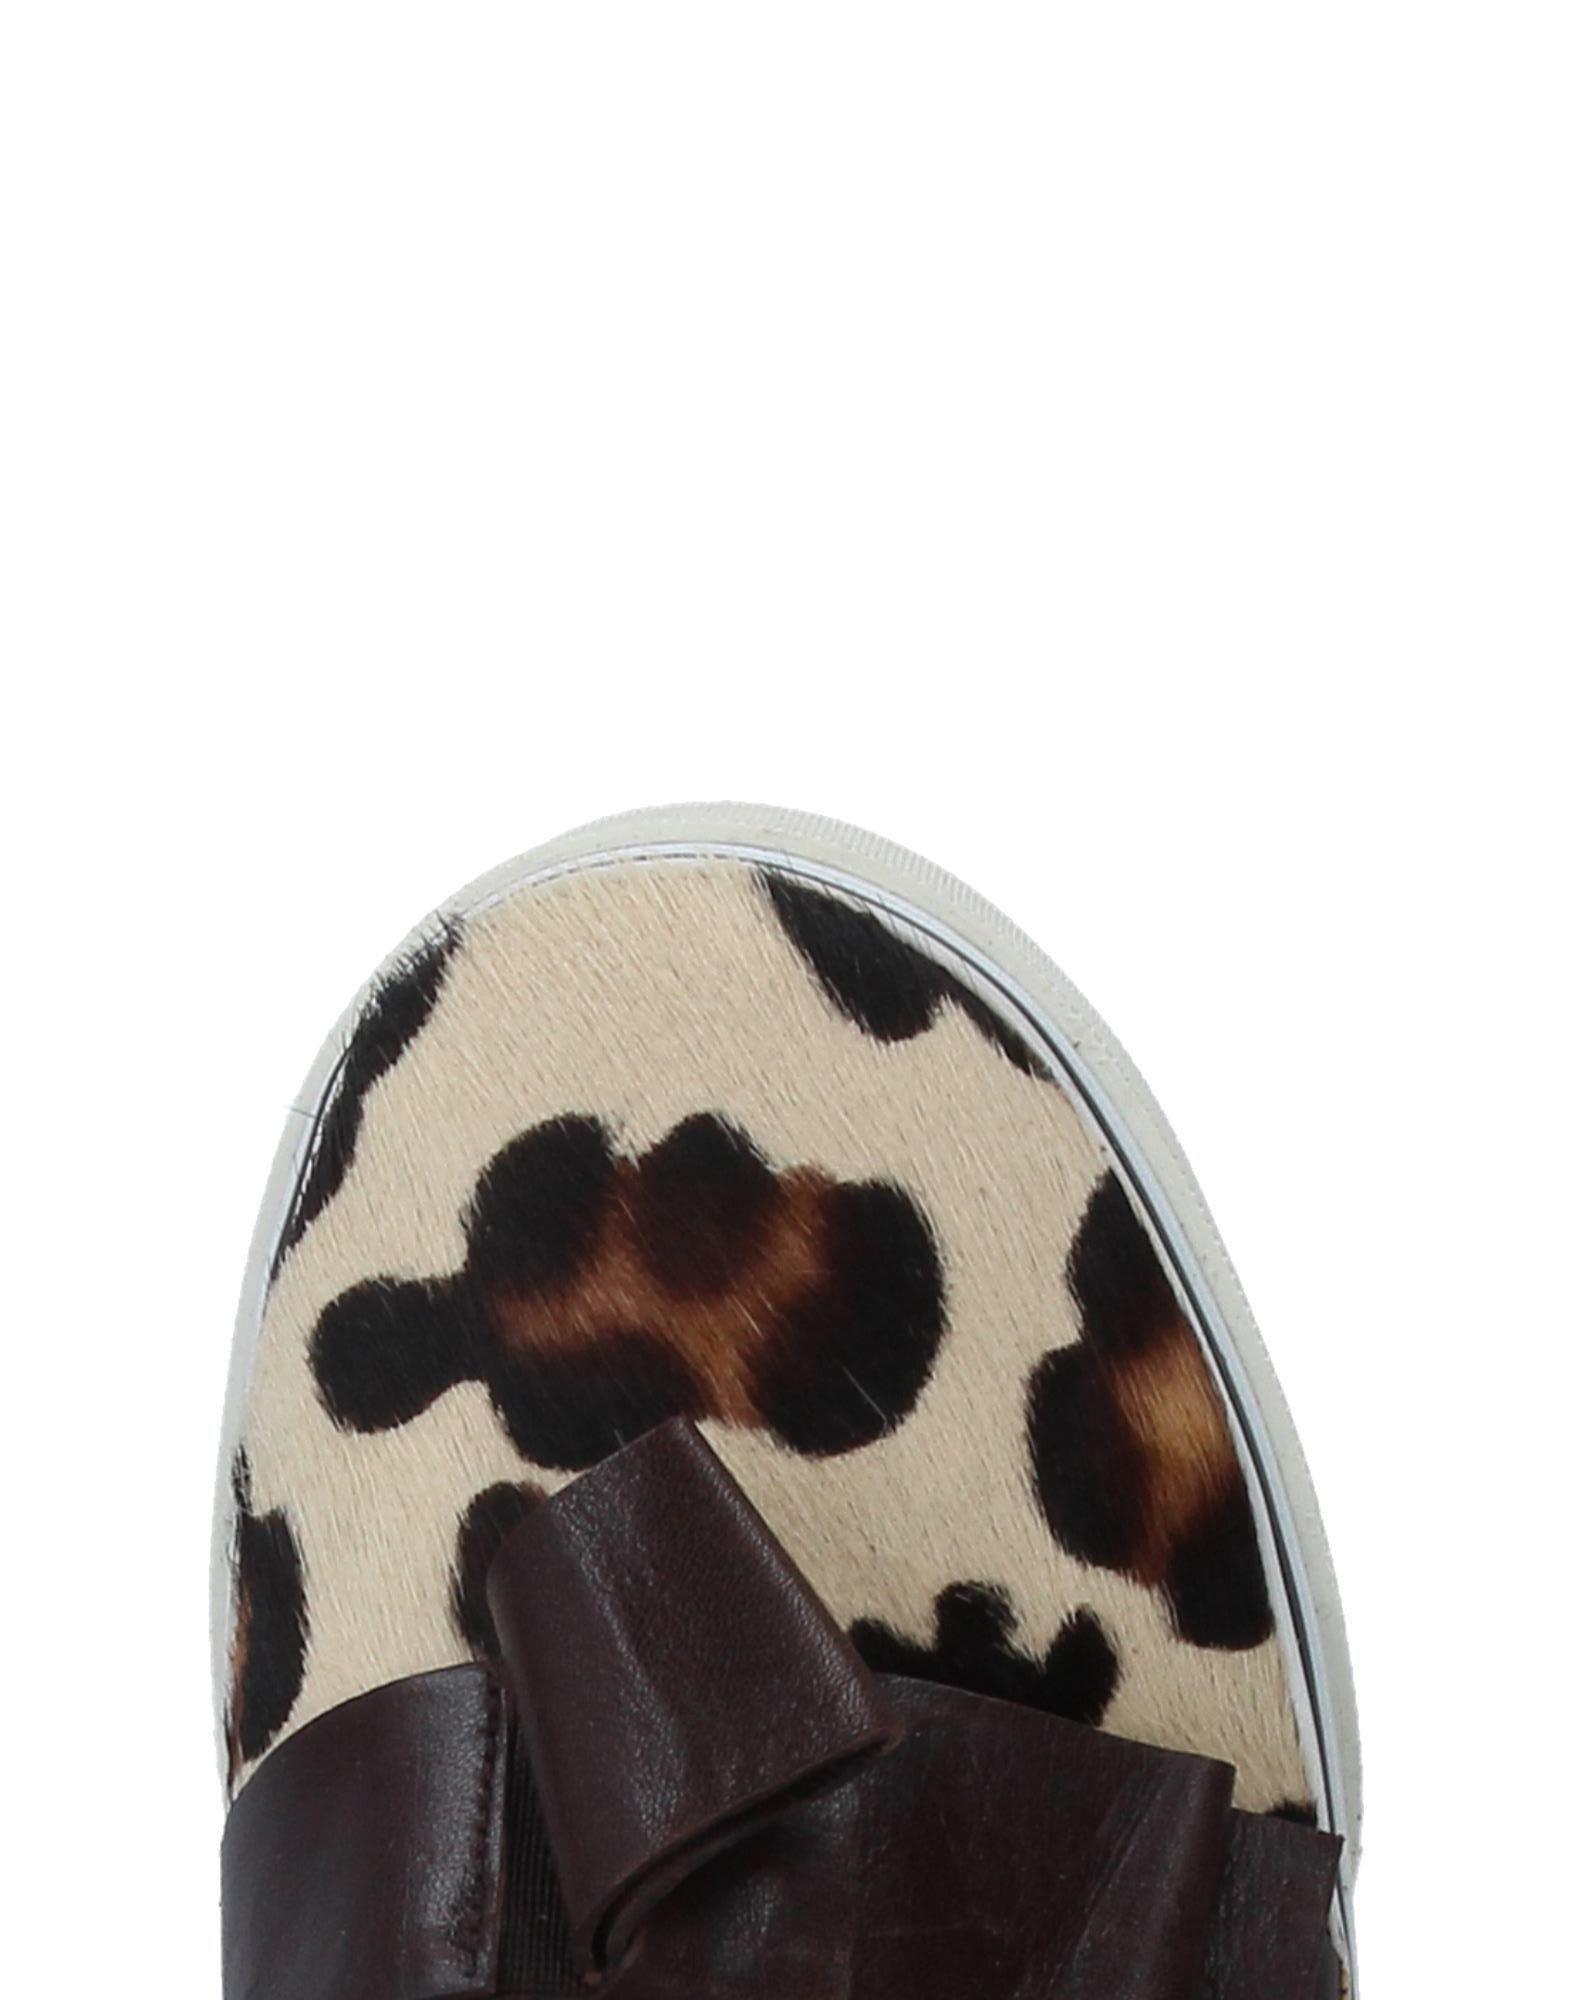 Stilvolle billige Schuhe Damen ROT(V) Sneakers Damen Schuhe  11267830XU 299c96